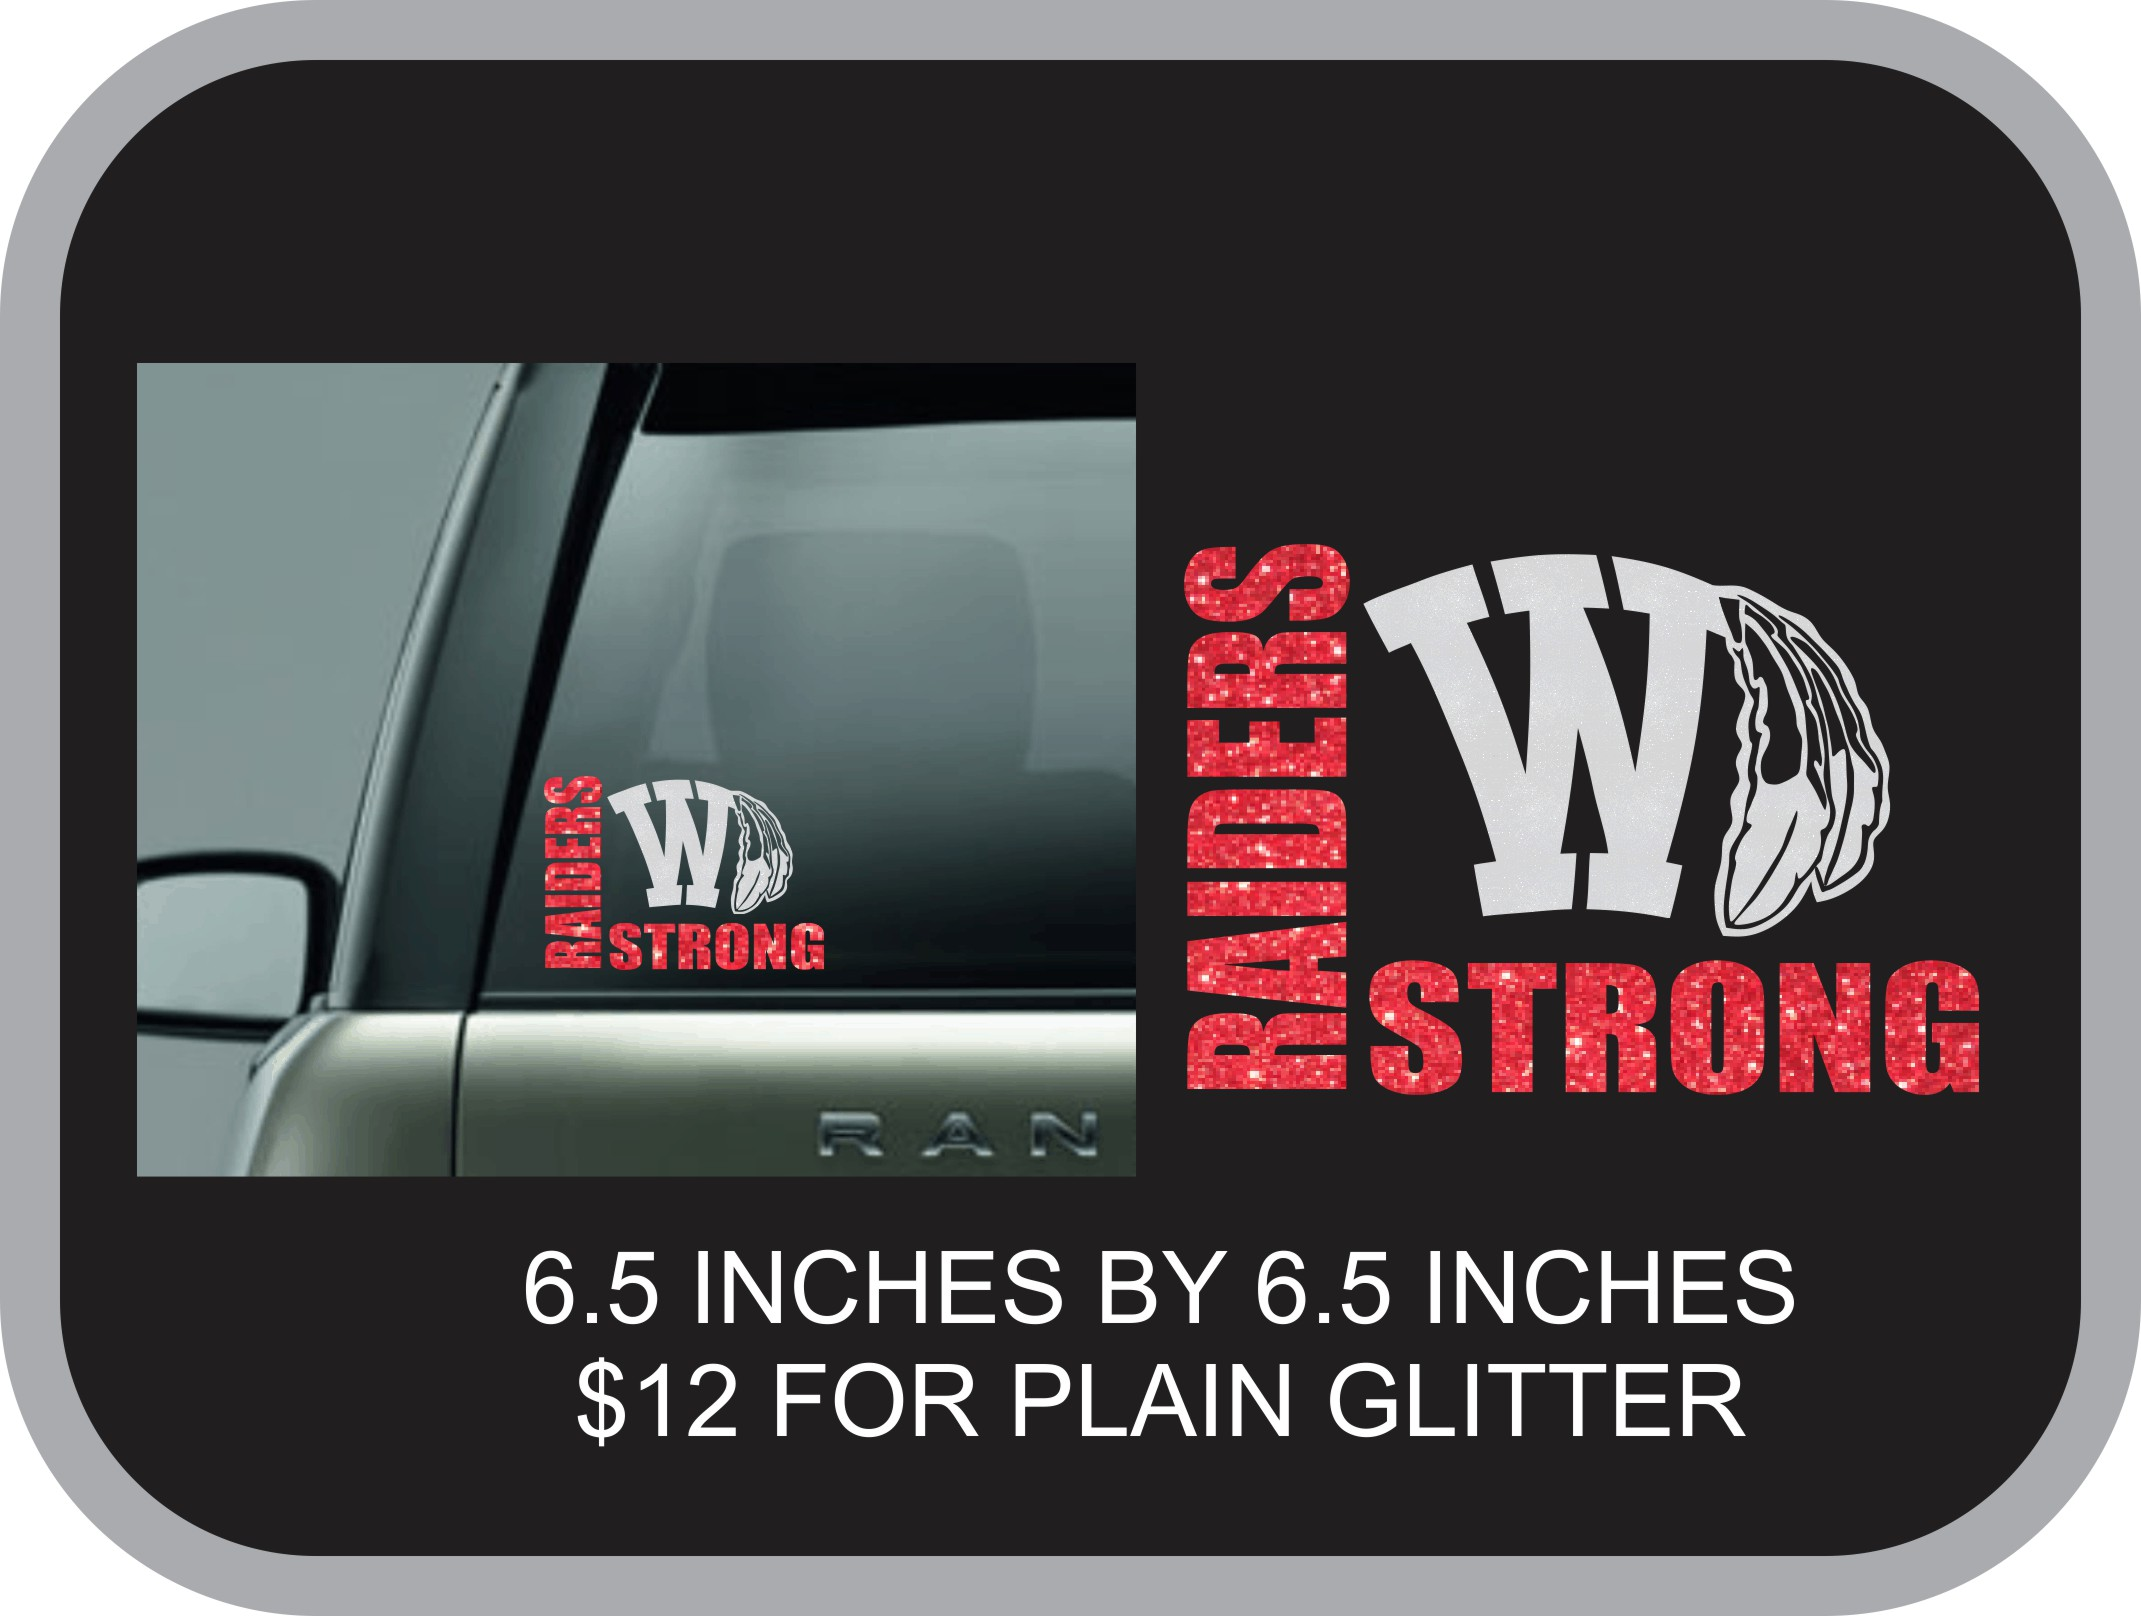 Raider Strong Glitter Window Decal